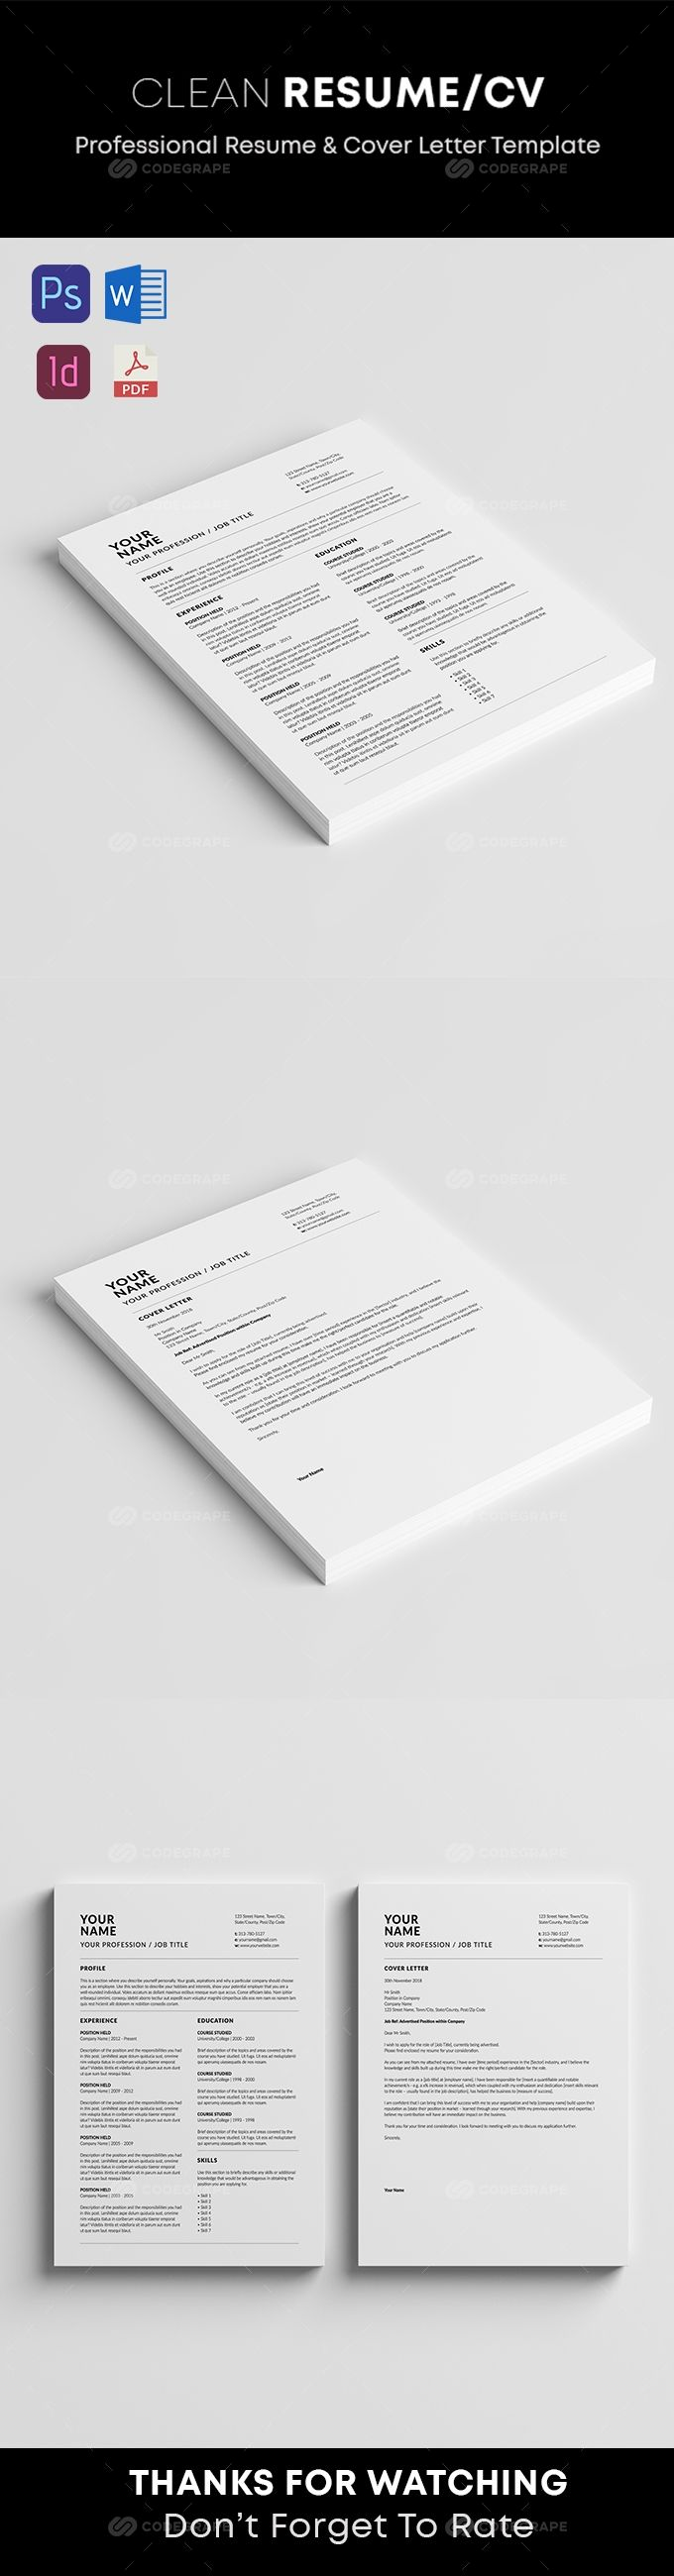 Resume Resume cover letter template, Resume, Cover